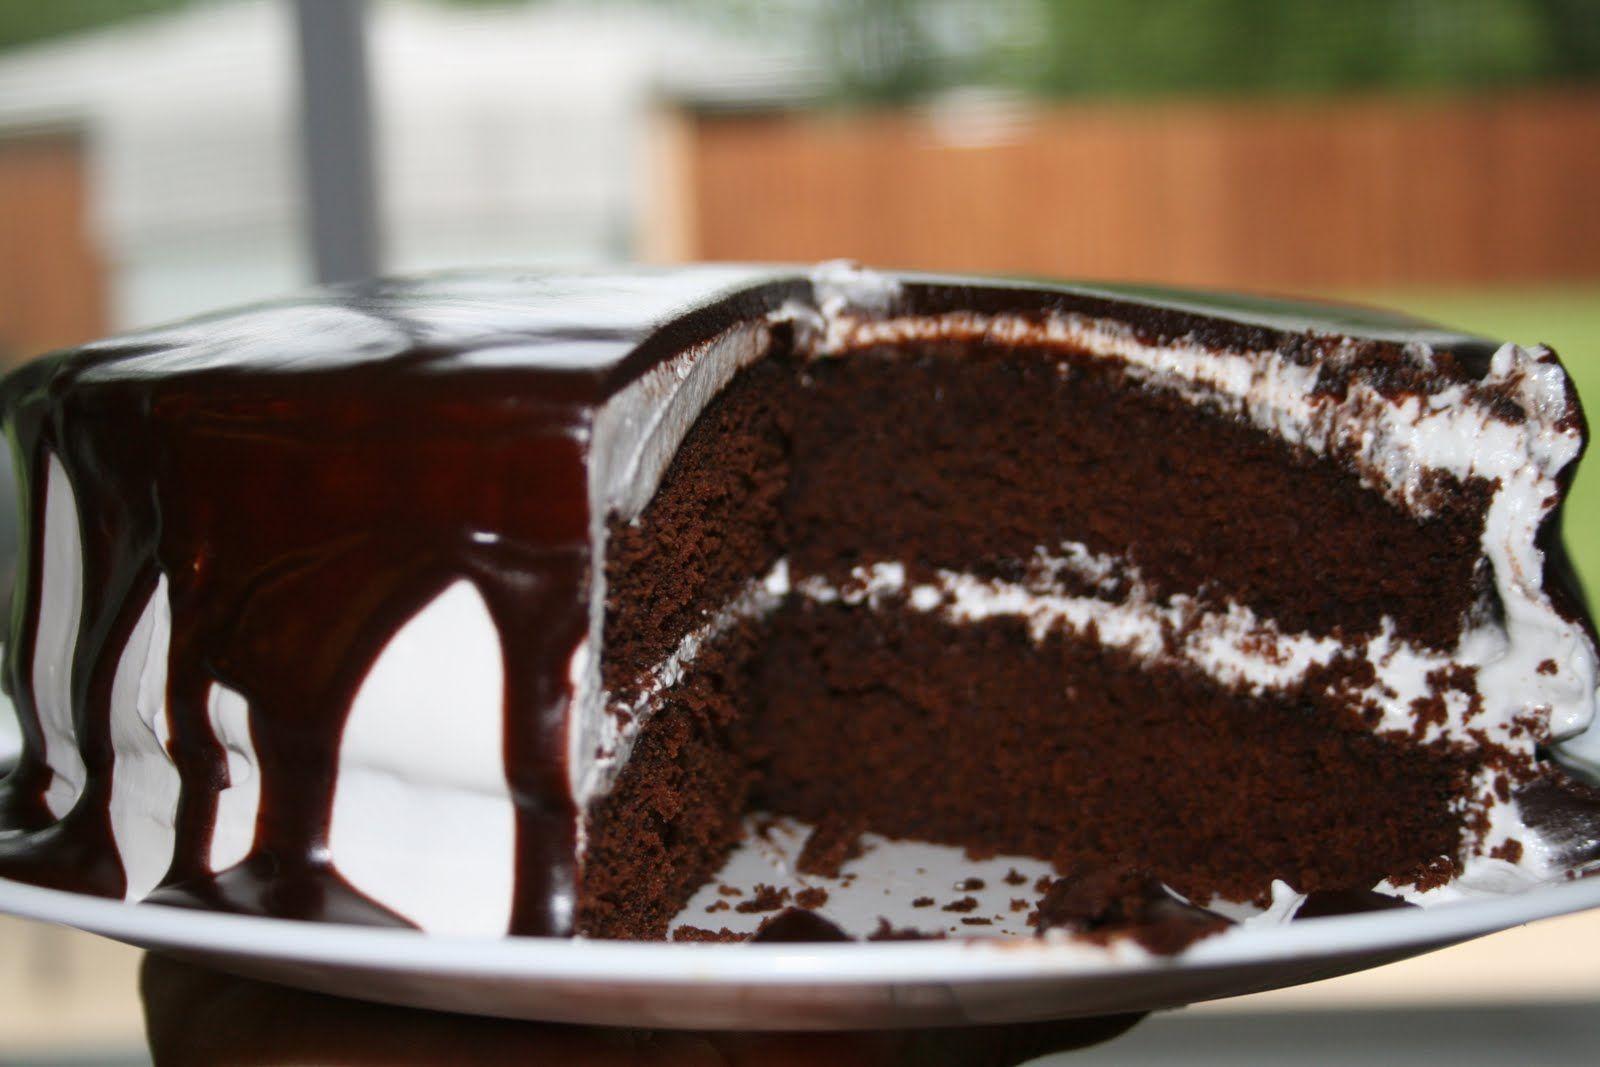 World Best Birthday Cake Recipe | Noodles and Needle Pricks